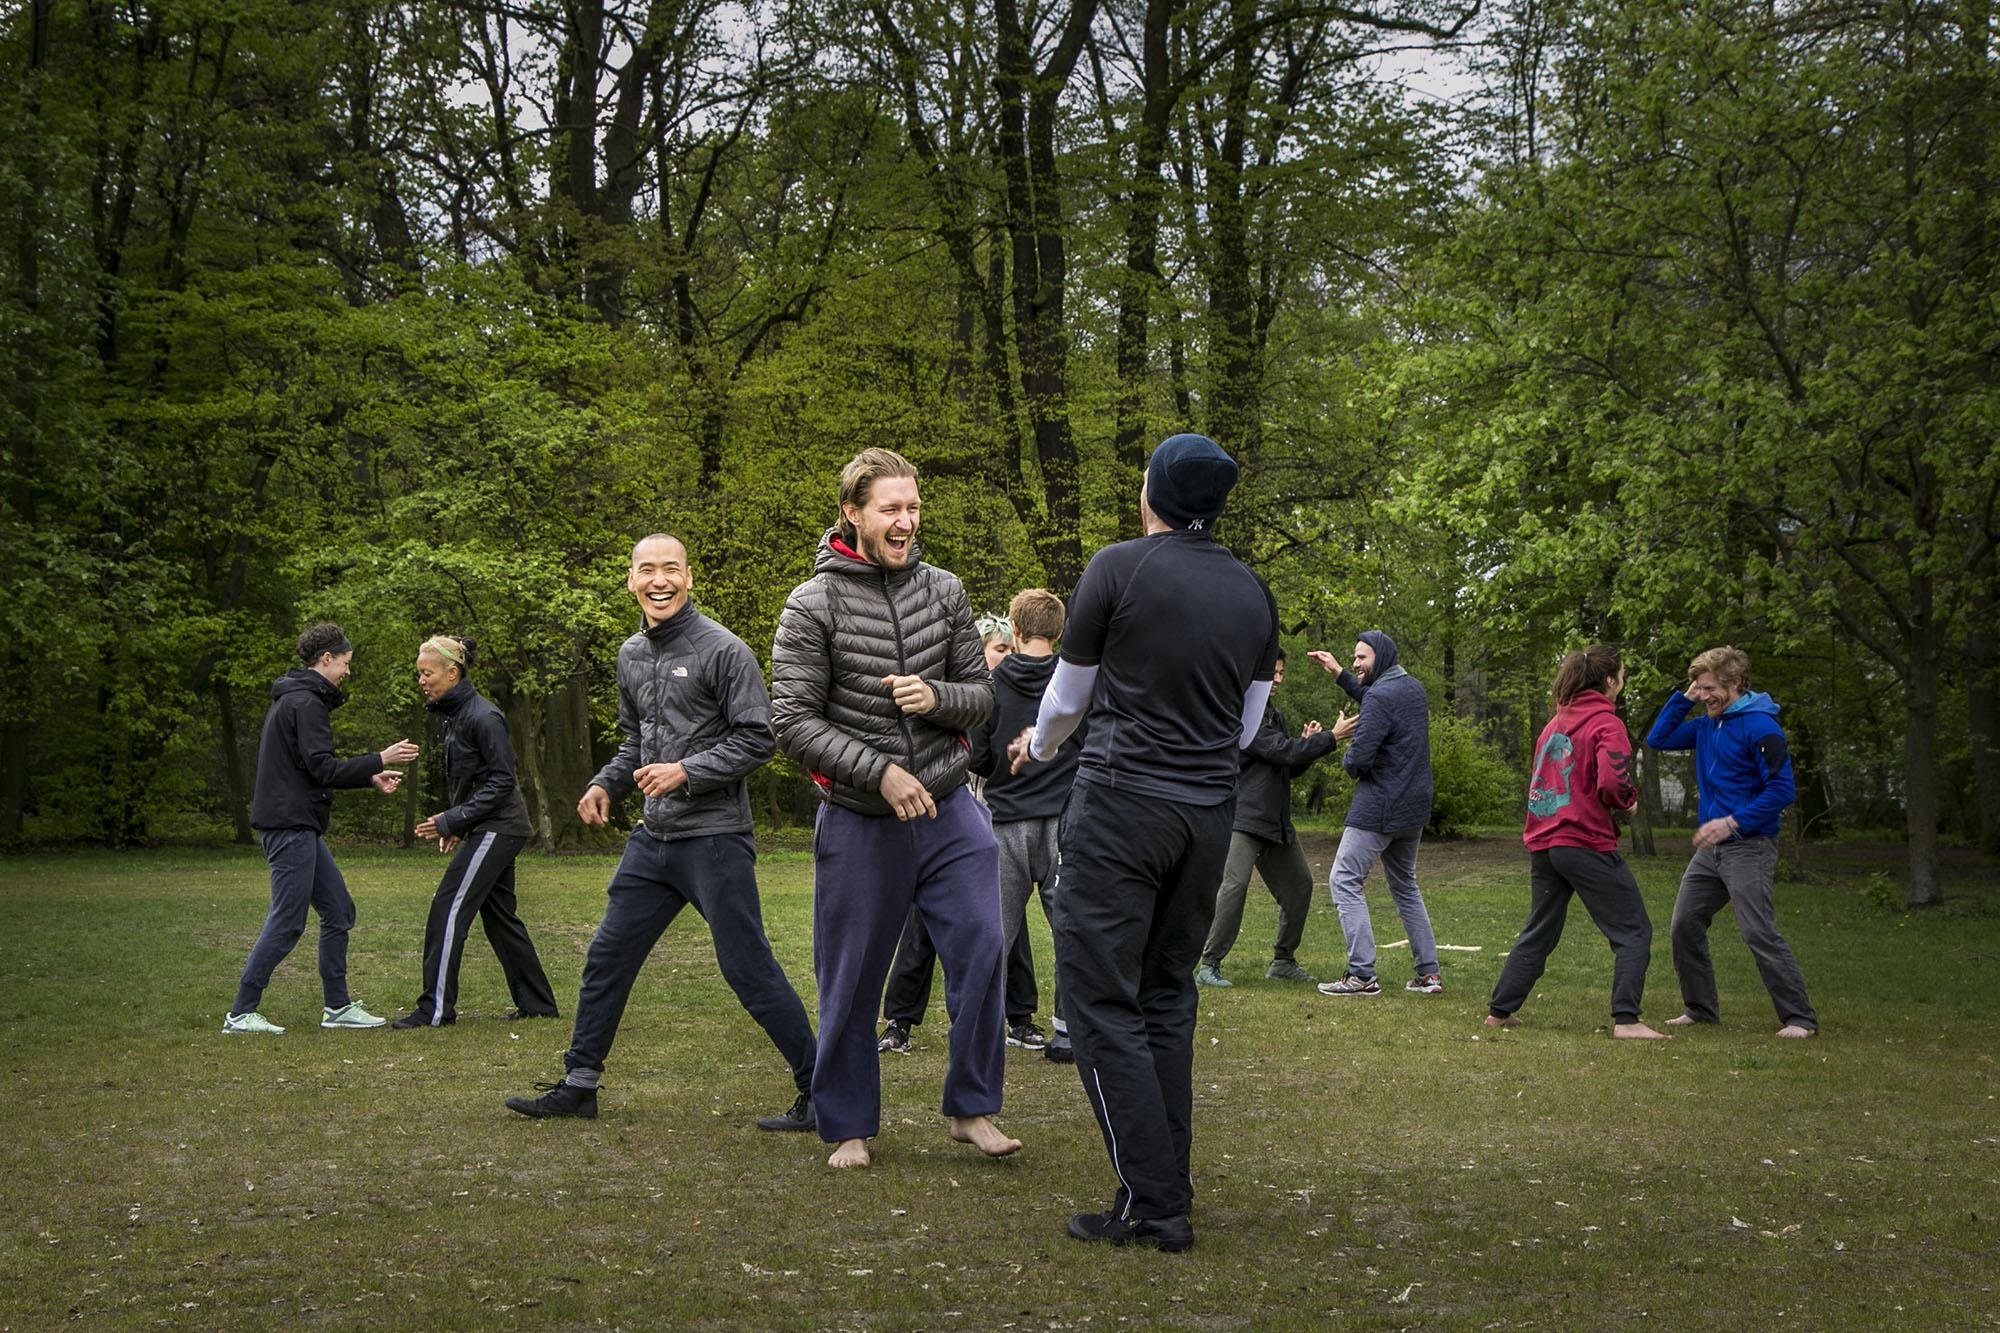 Movement Play workshop at Tempelhof Park | Berlin, Germany